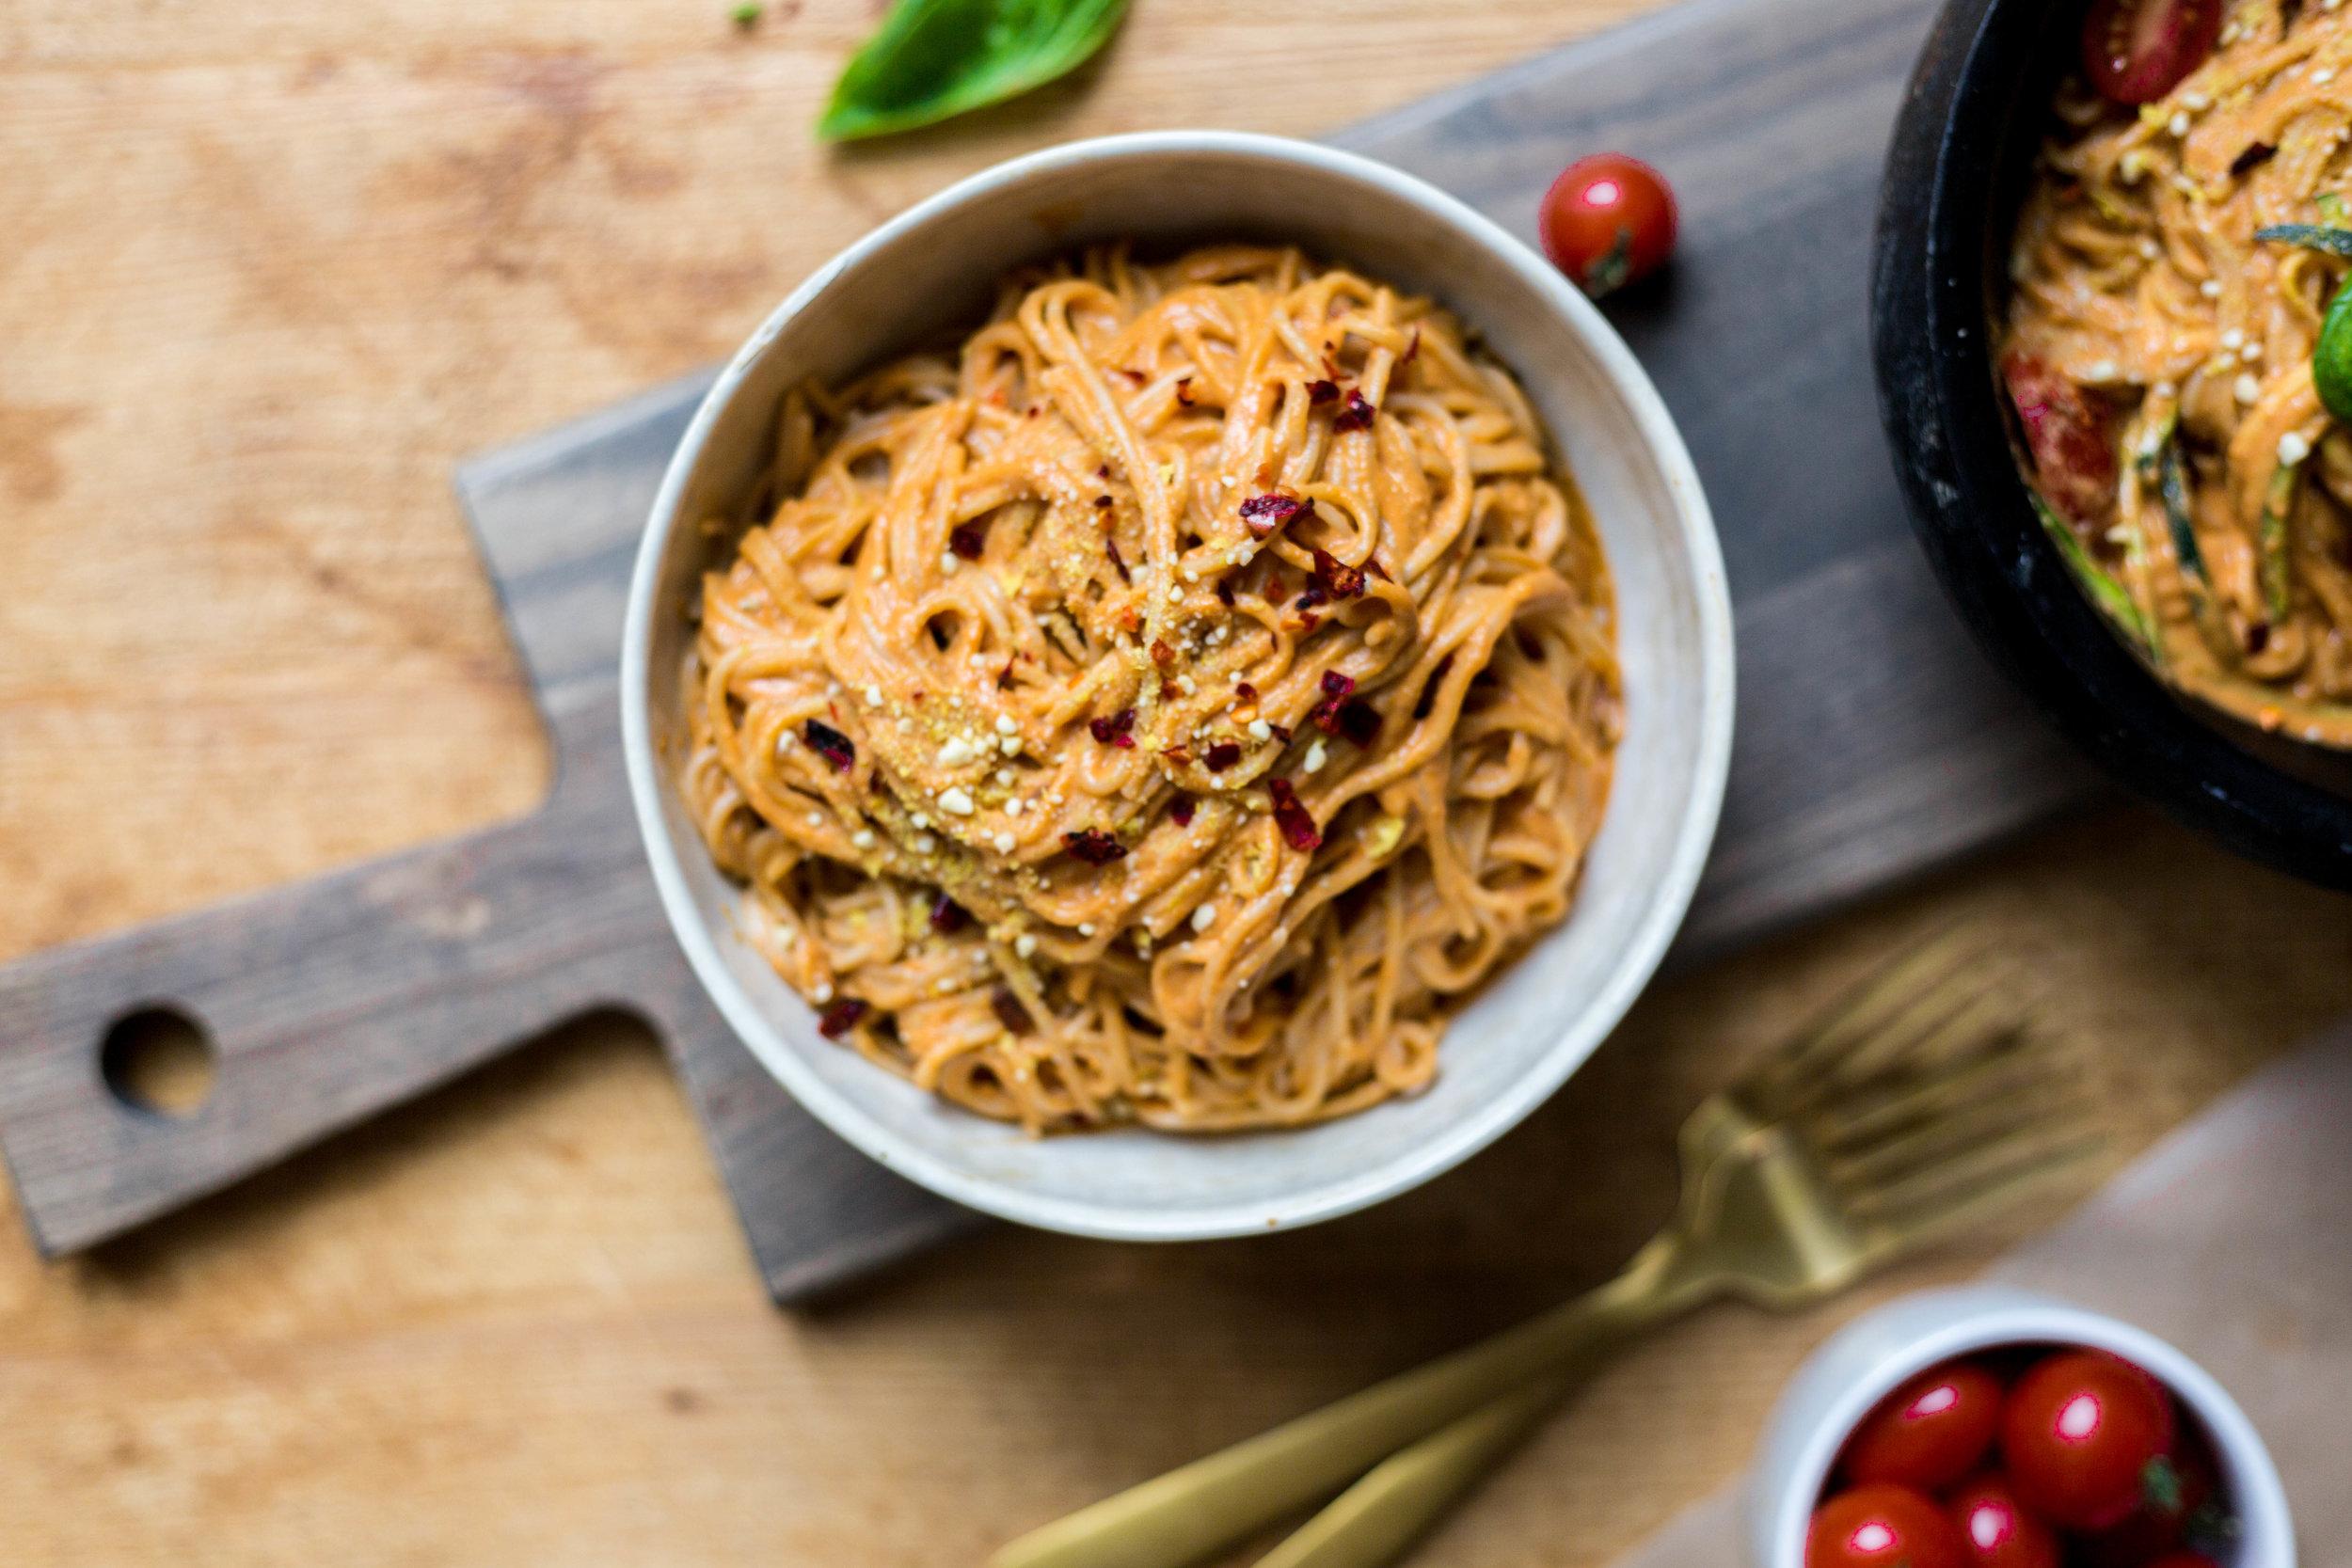 Raw Vegan Family Friendly Marinara Recipe | Plant-based | Healthy #dairyfree #glutenfree #puremamas